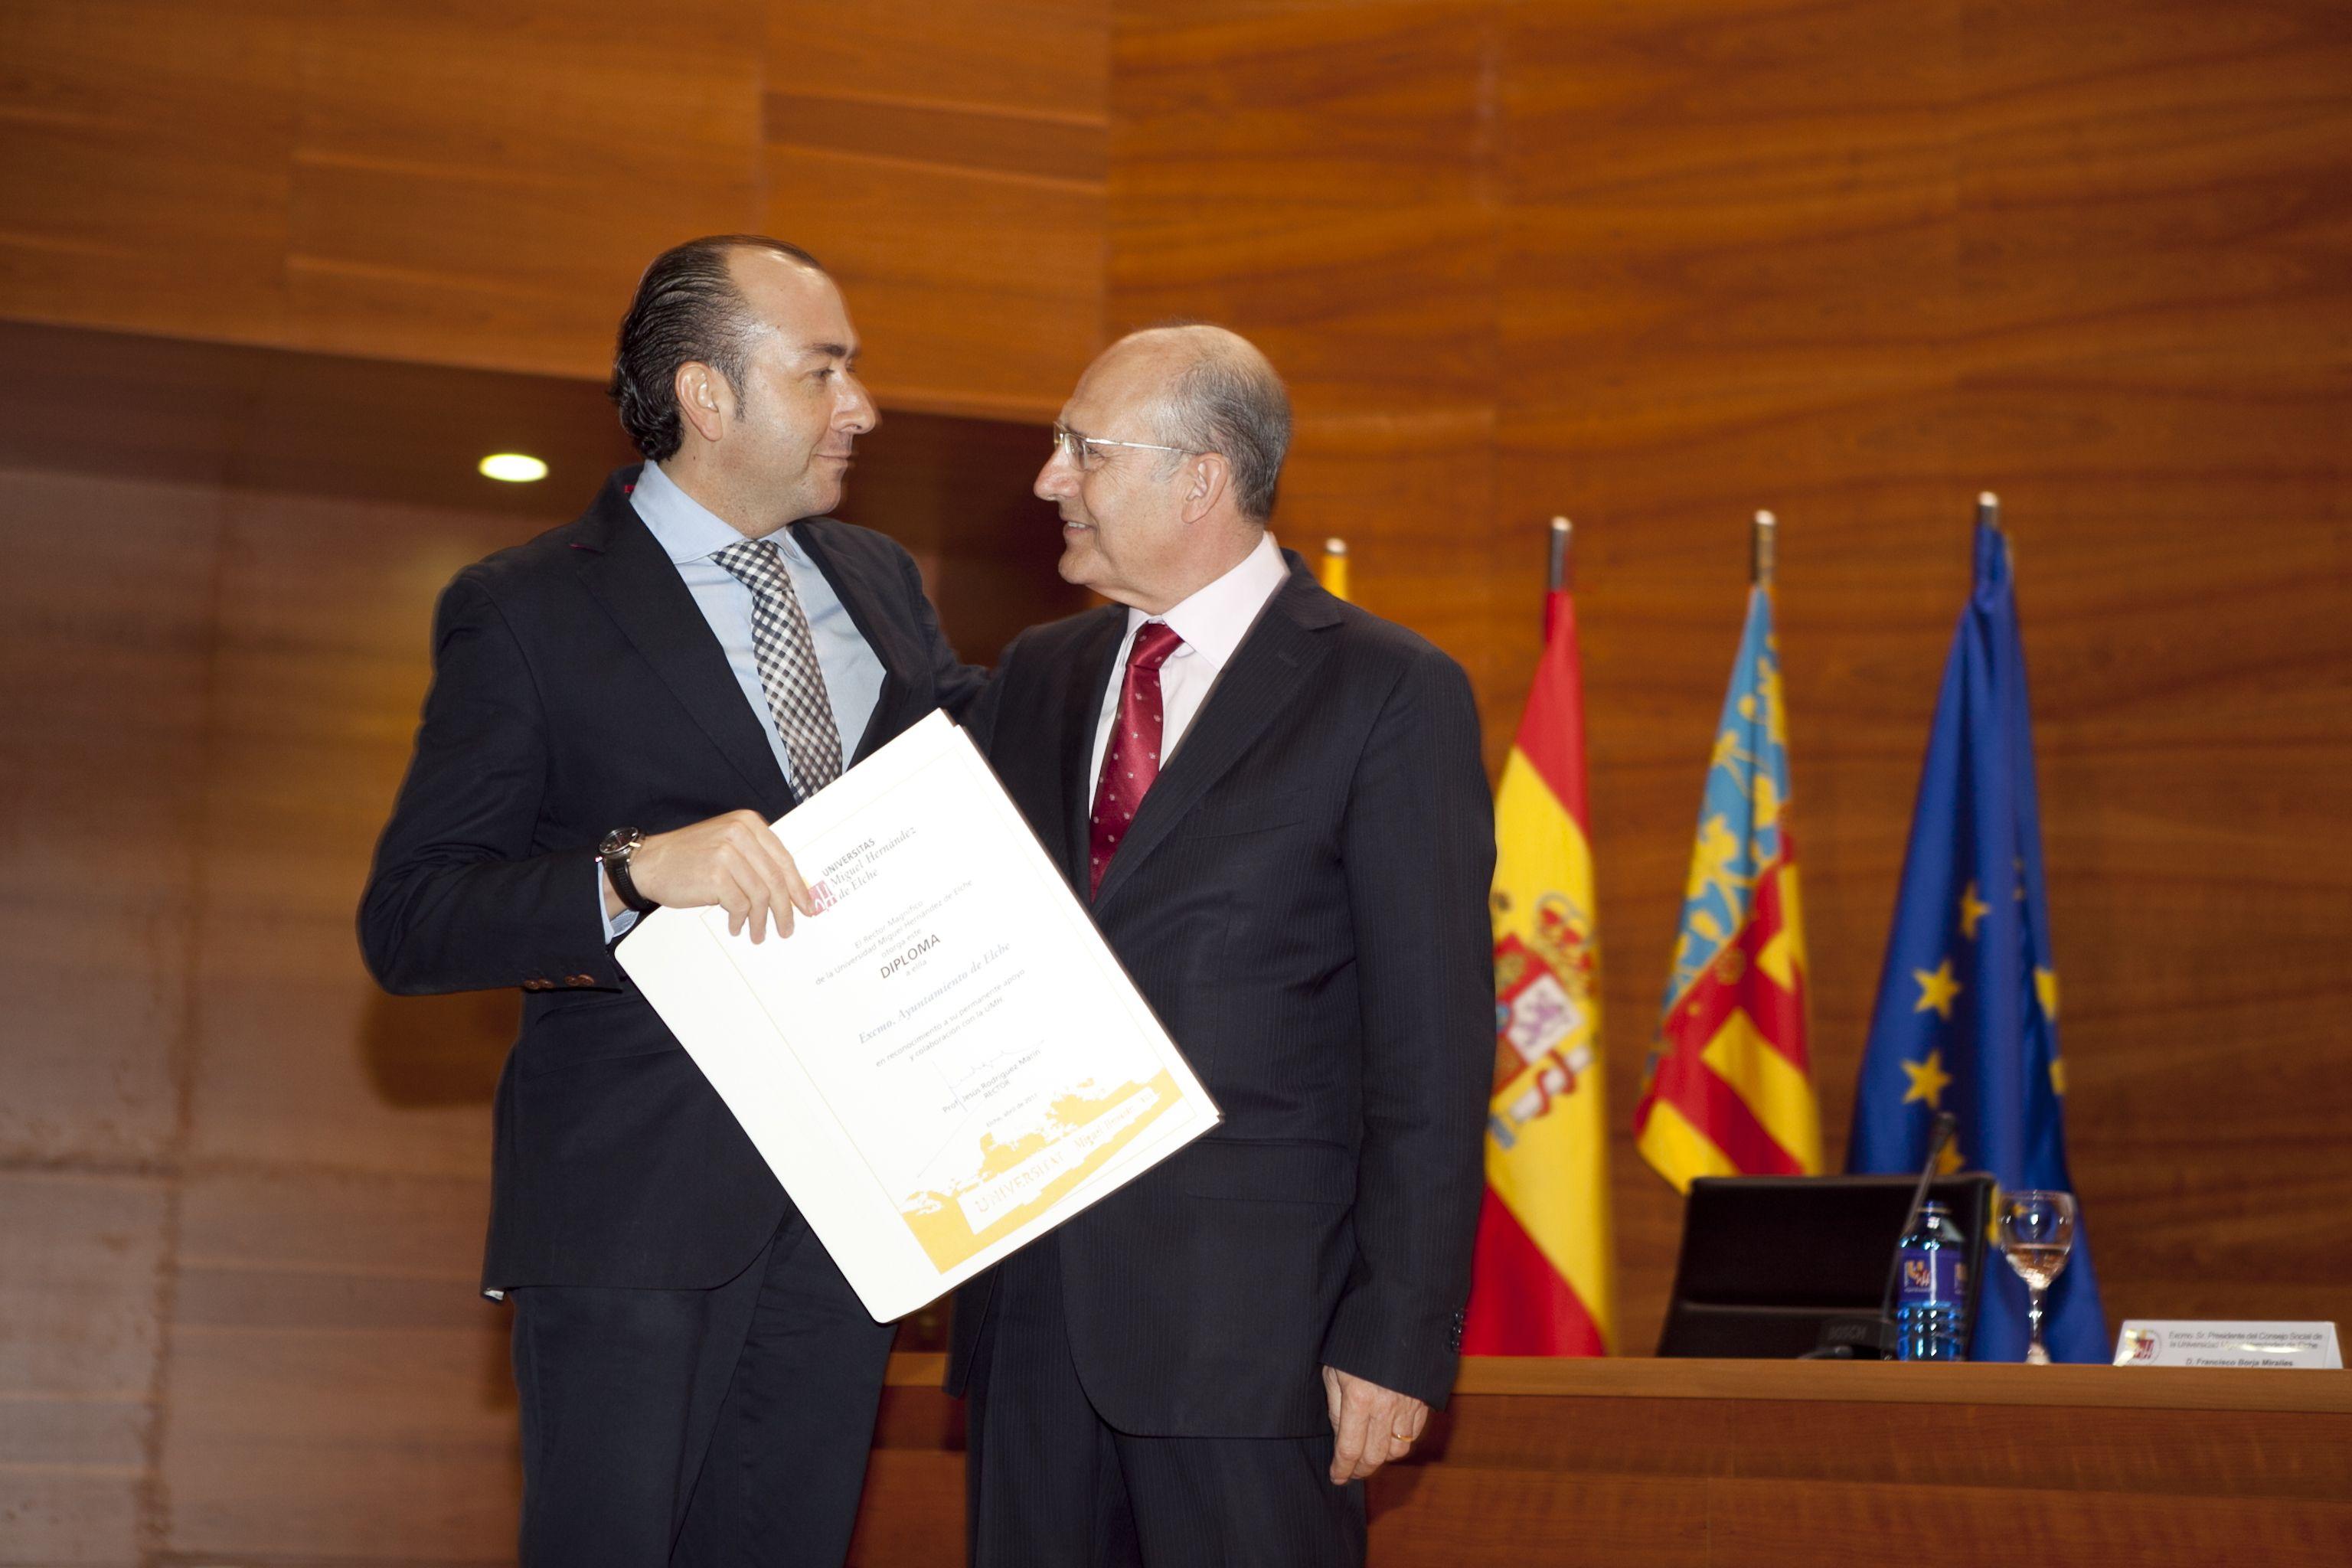 umh-diplomas-rector_mg_7052.jpg